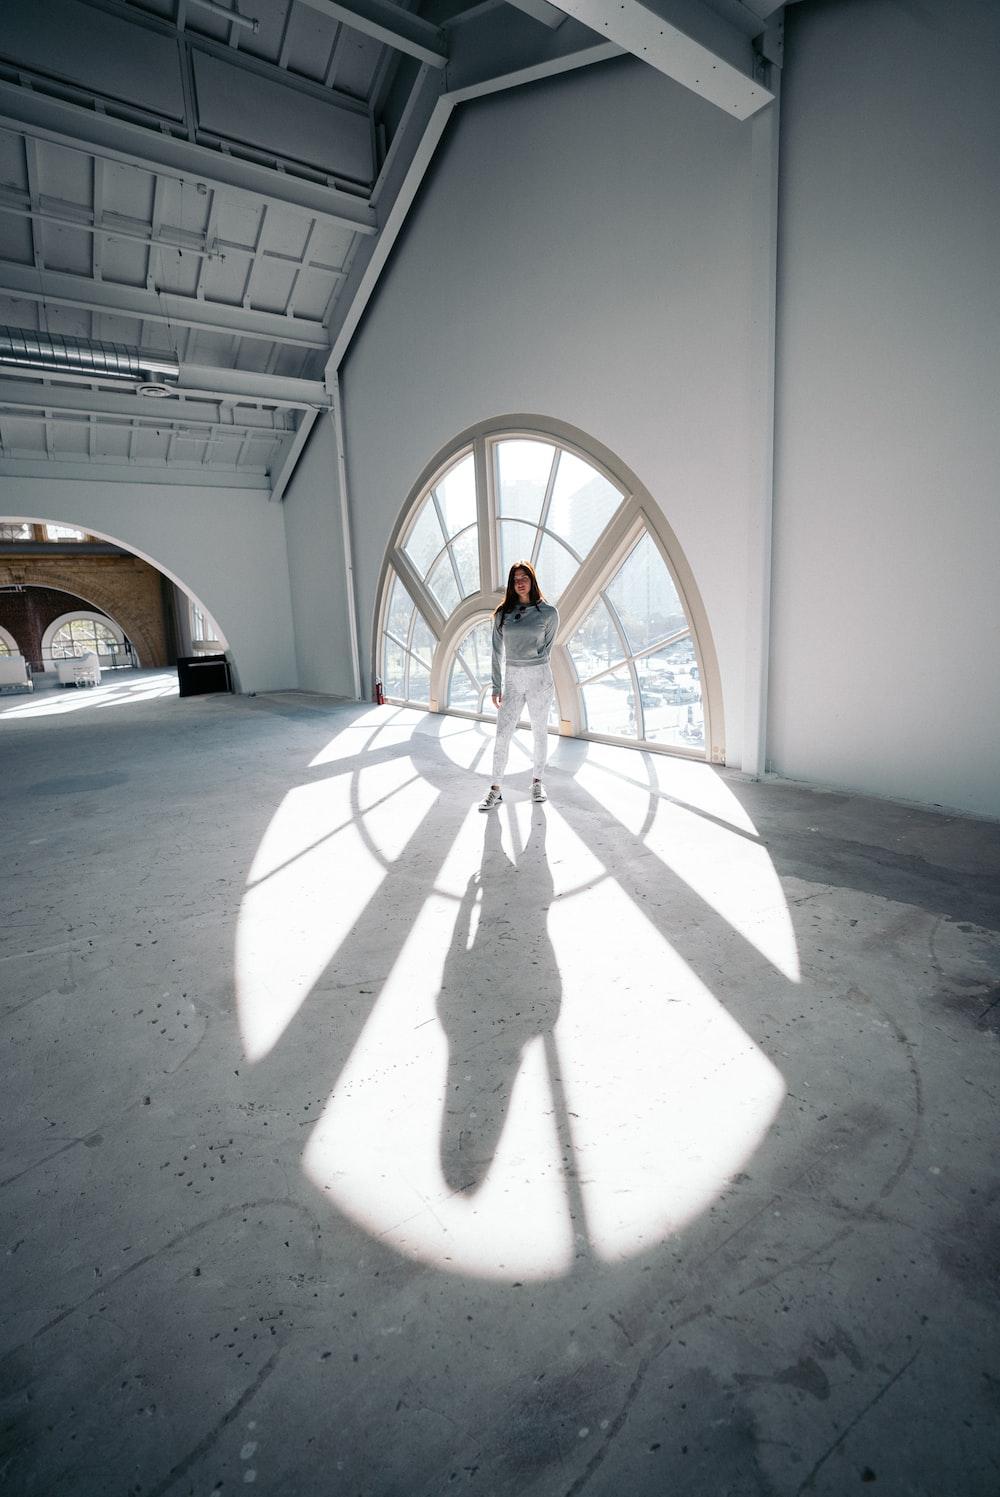 woman standing near glass window of an empty building